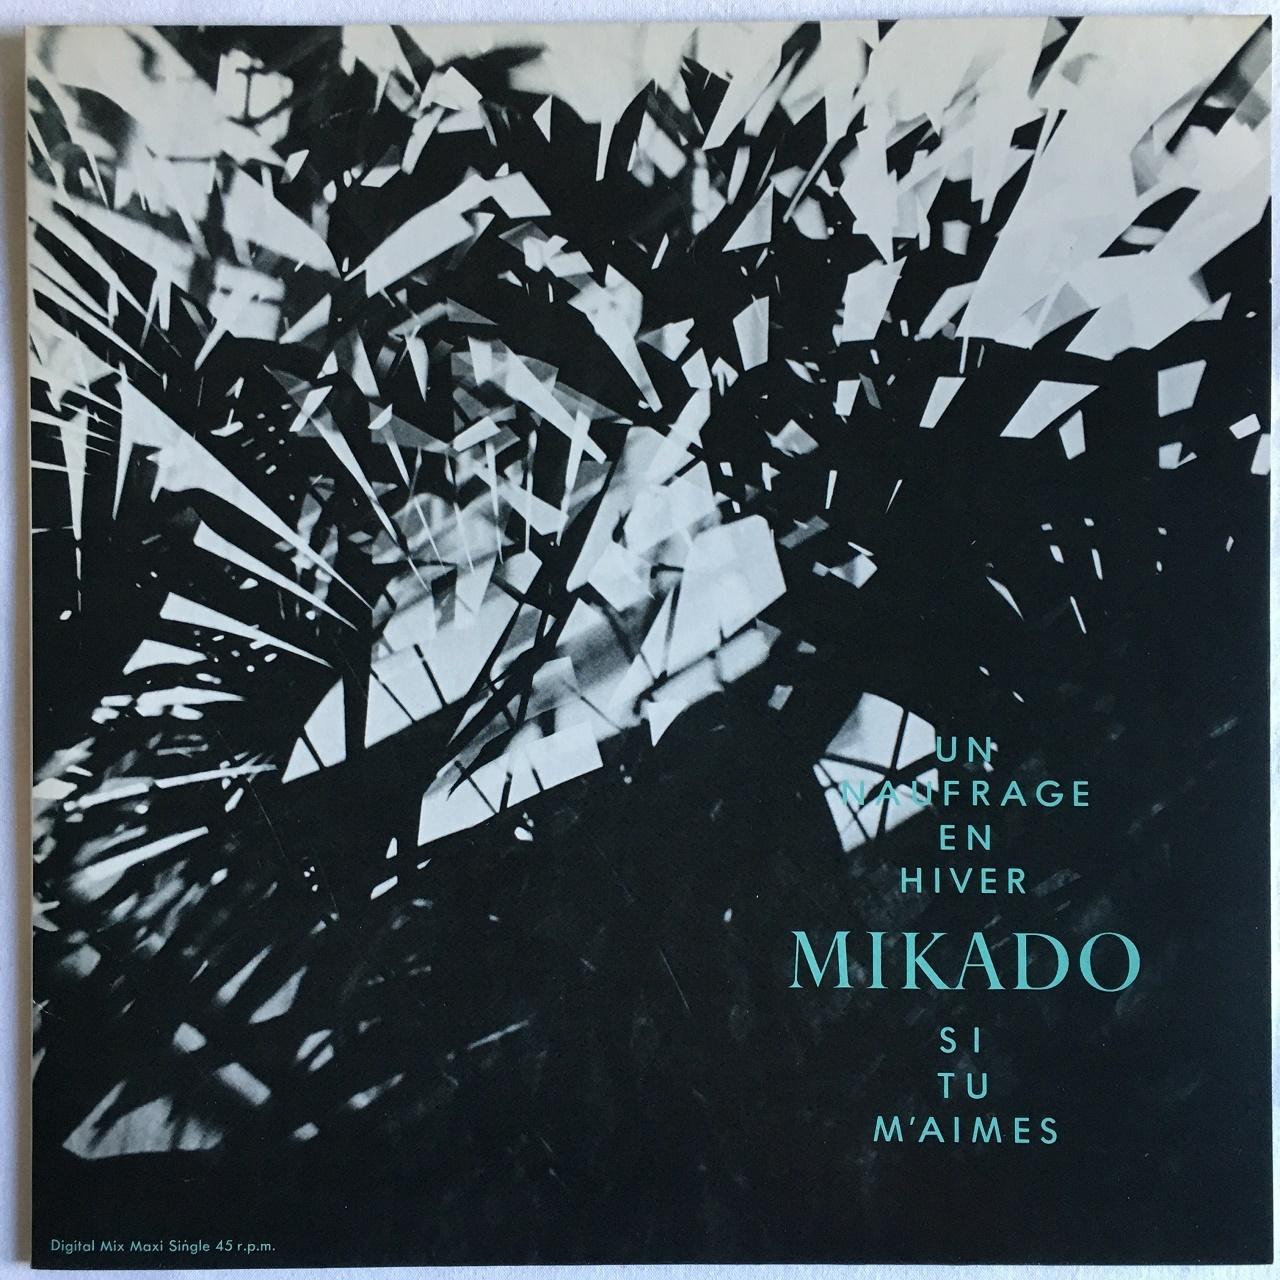 【12inch・国内盤】ミカド / 冬のノフラージュ